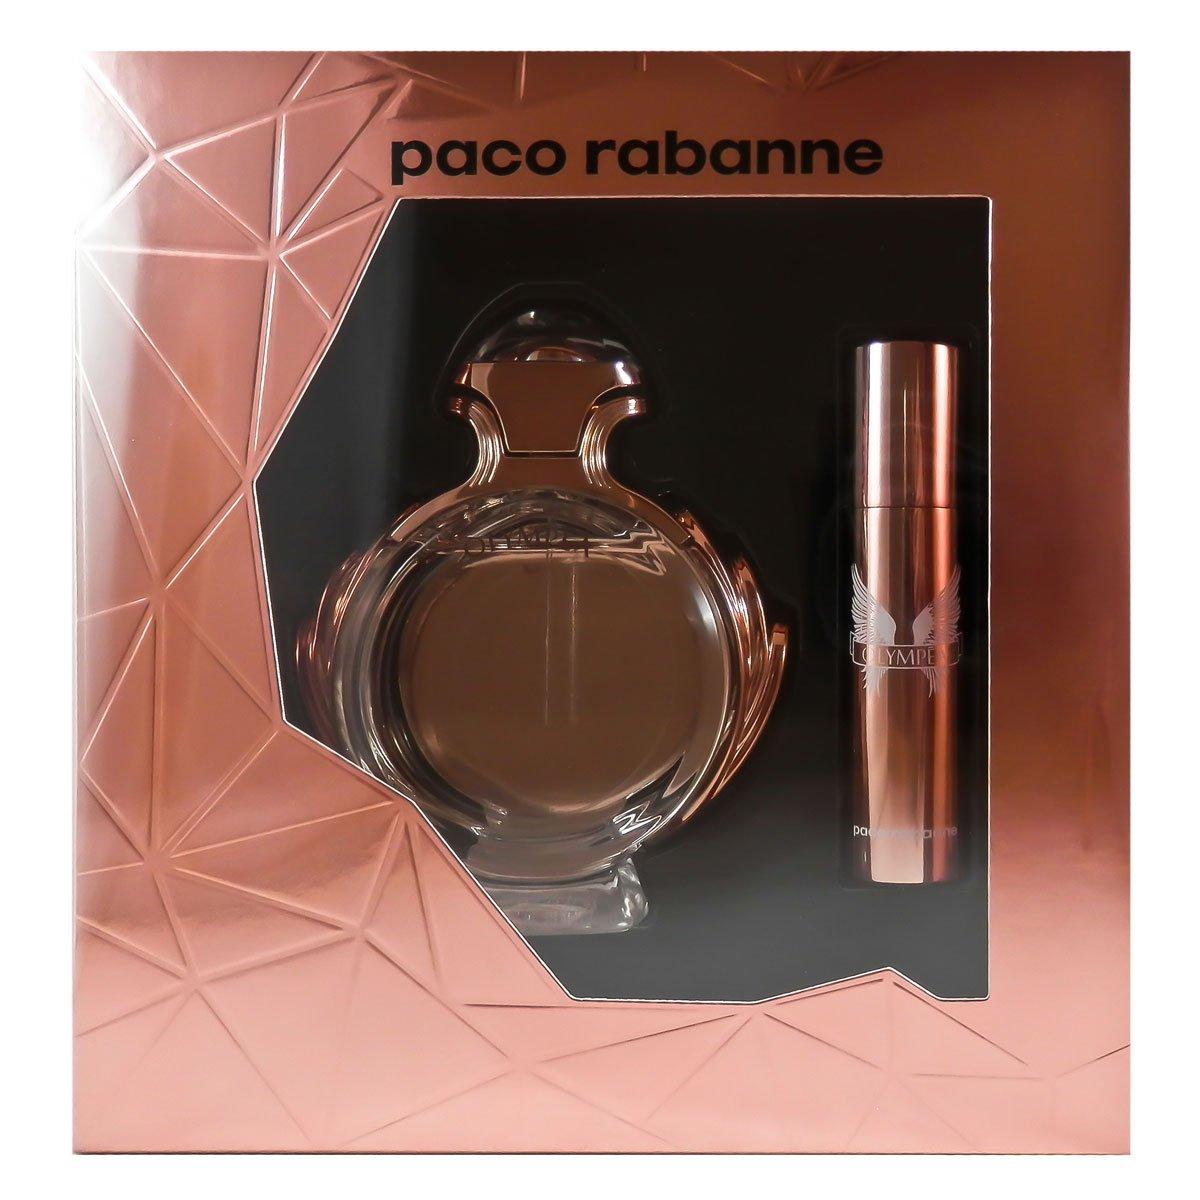 PACO RABANNE OLYMPEA GIFT SET 475-42796